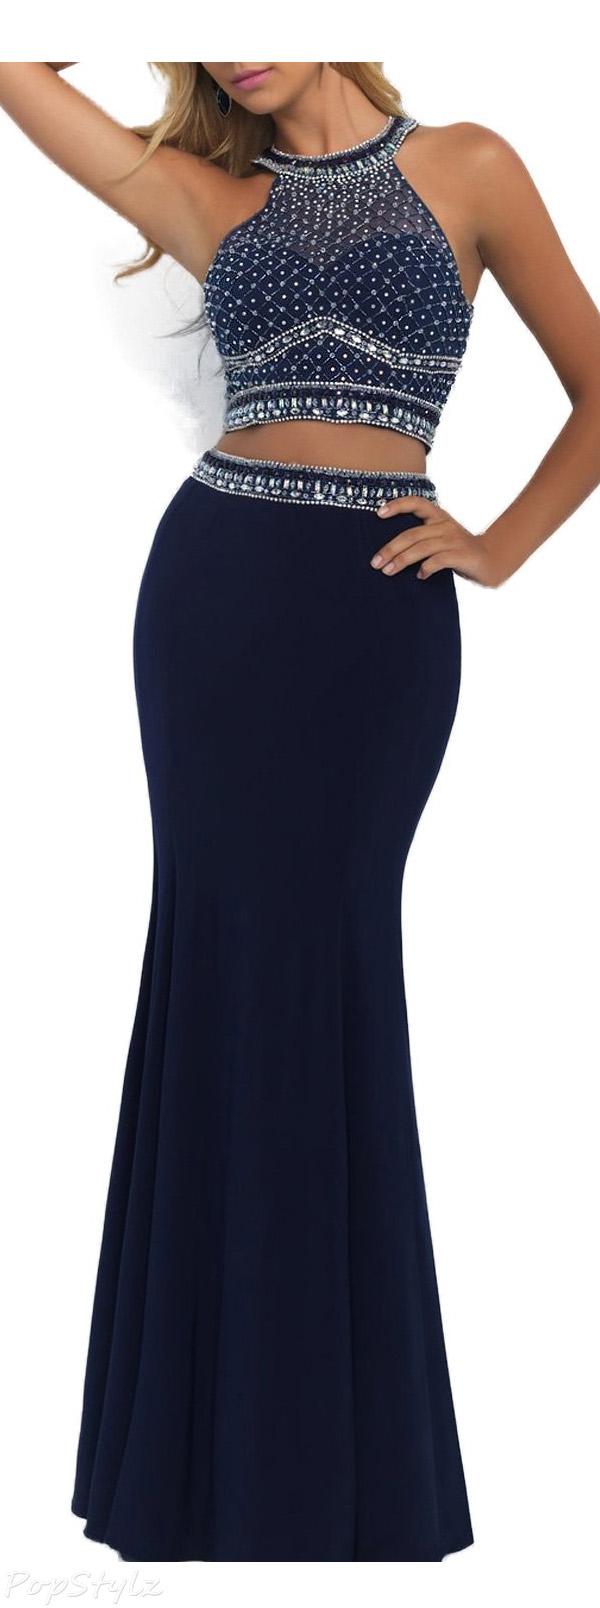 SeasonMallTwo-Piece Mermaid Long Formal Dress